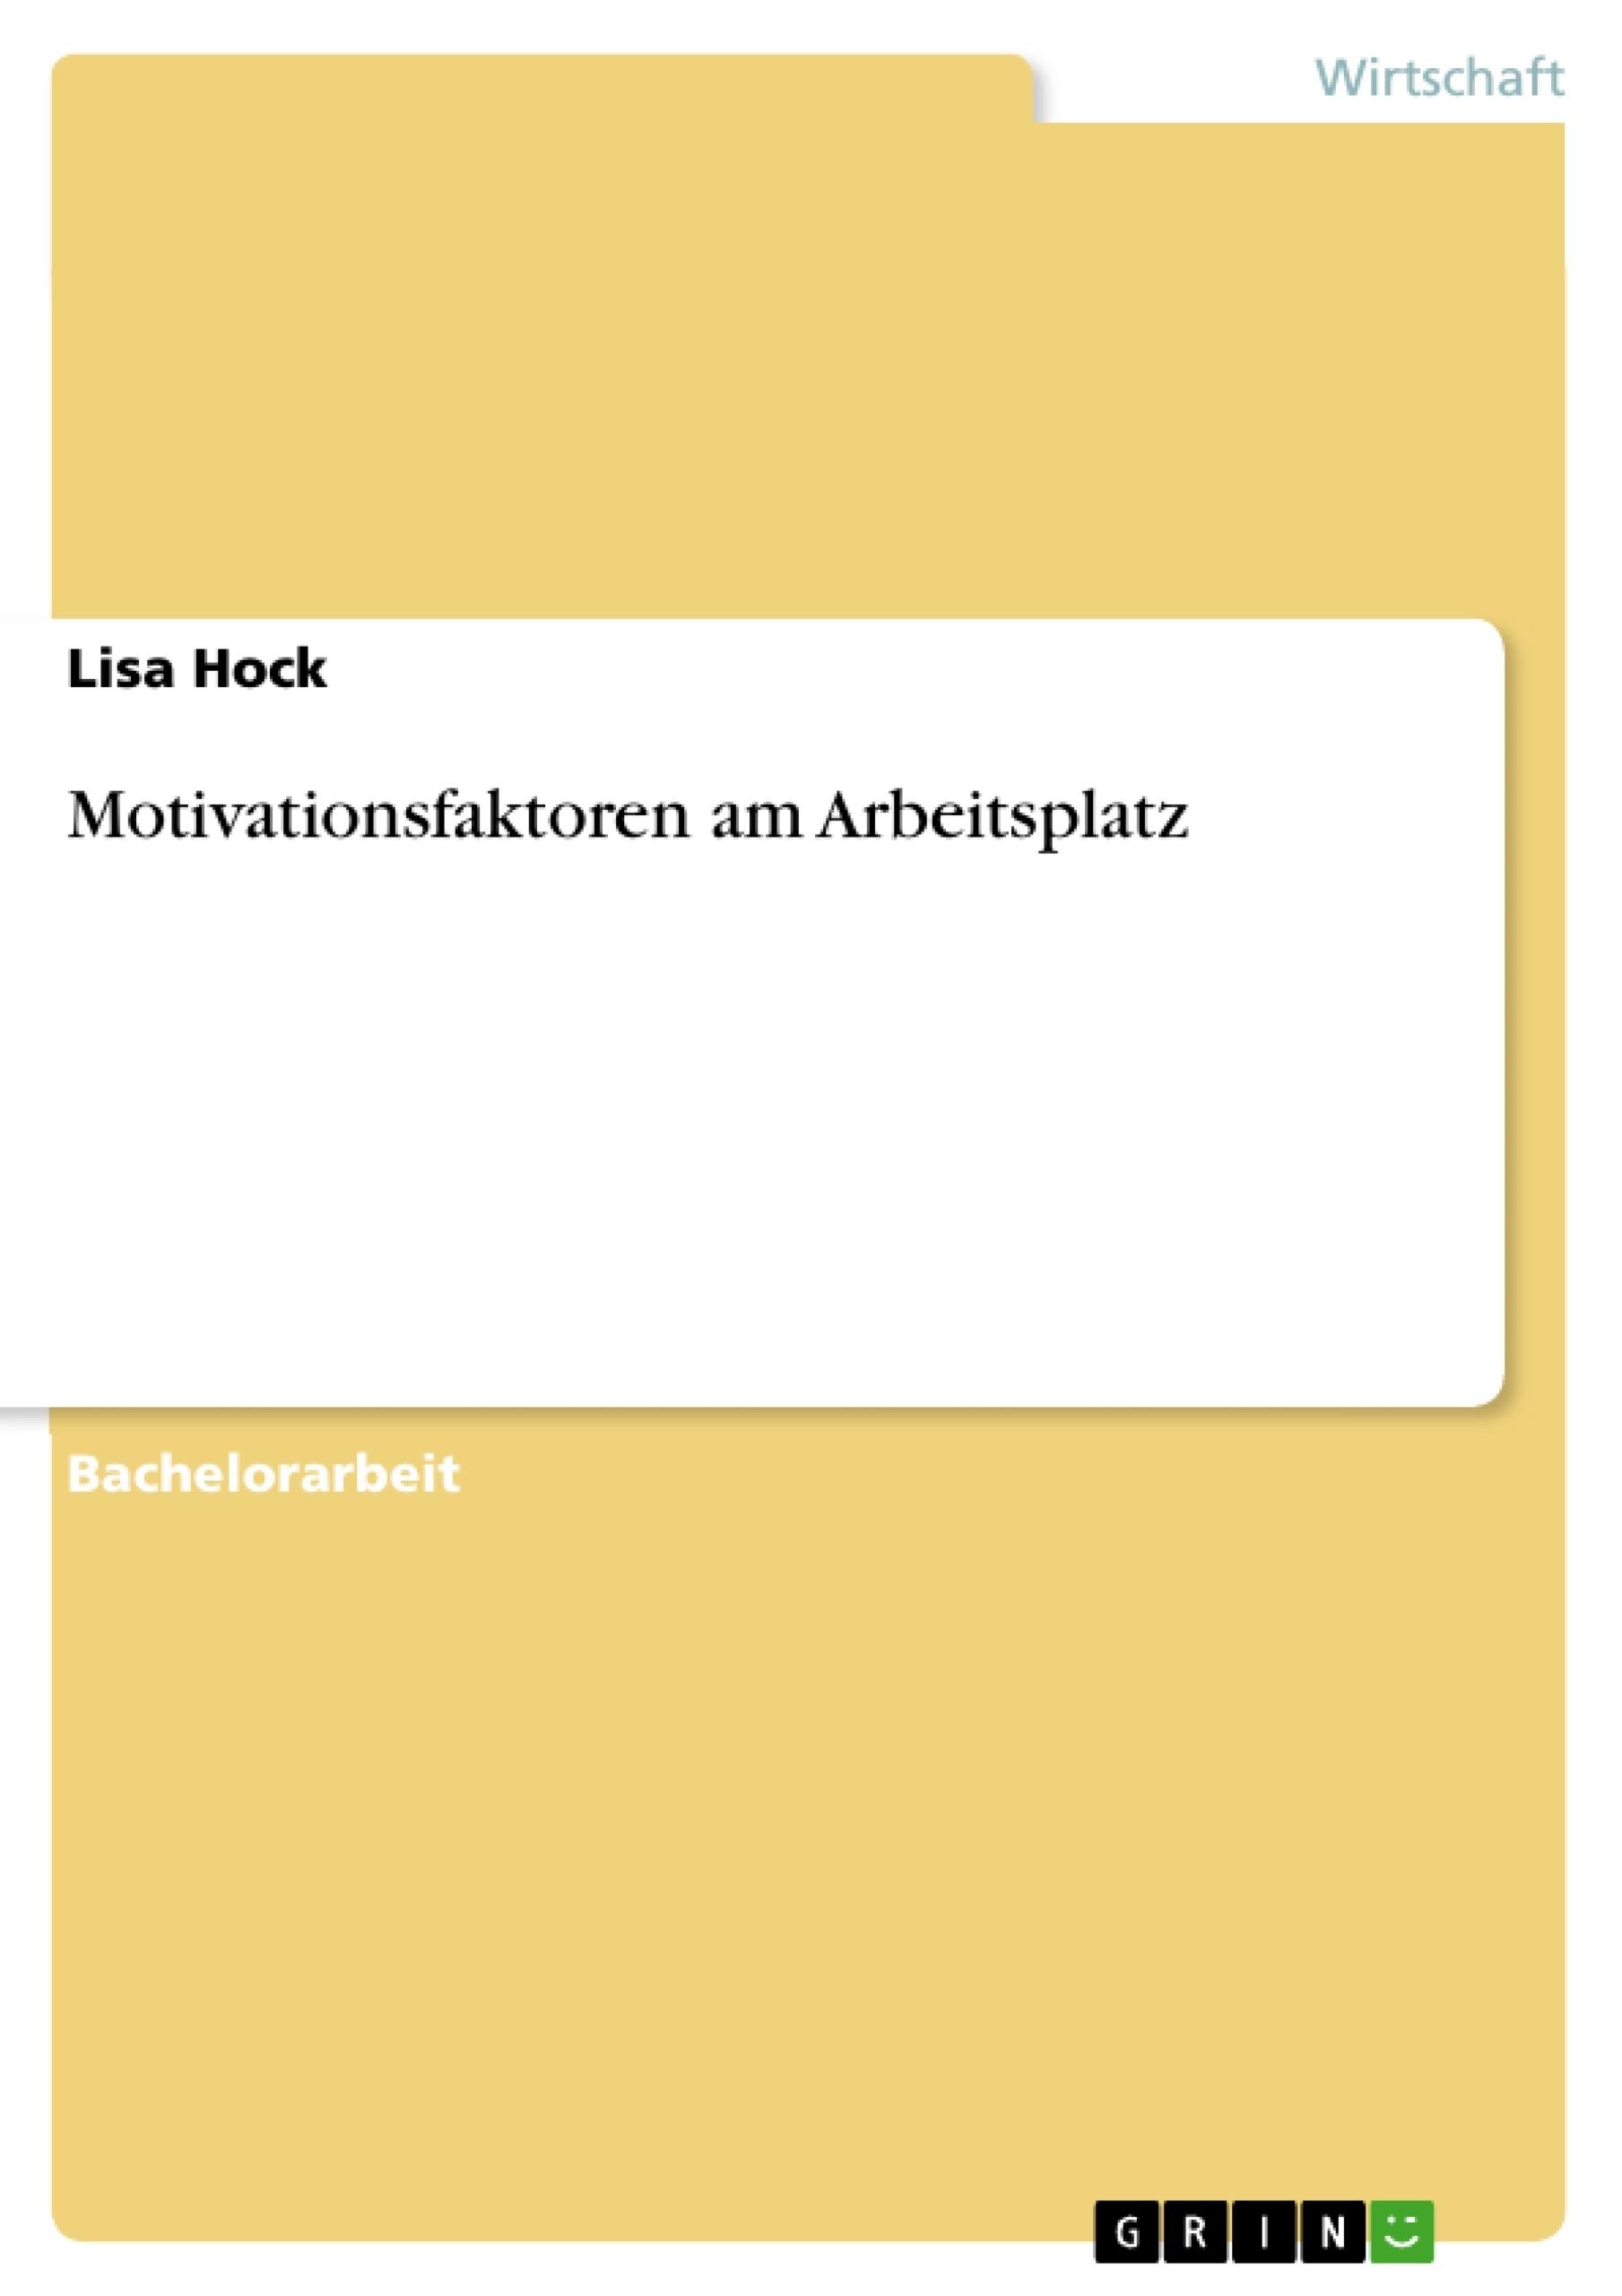 Titel: Motivationsfaktoren am Arbeitsplatz